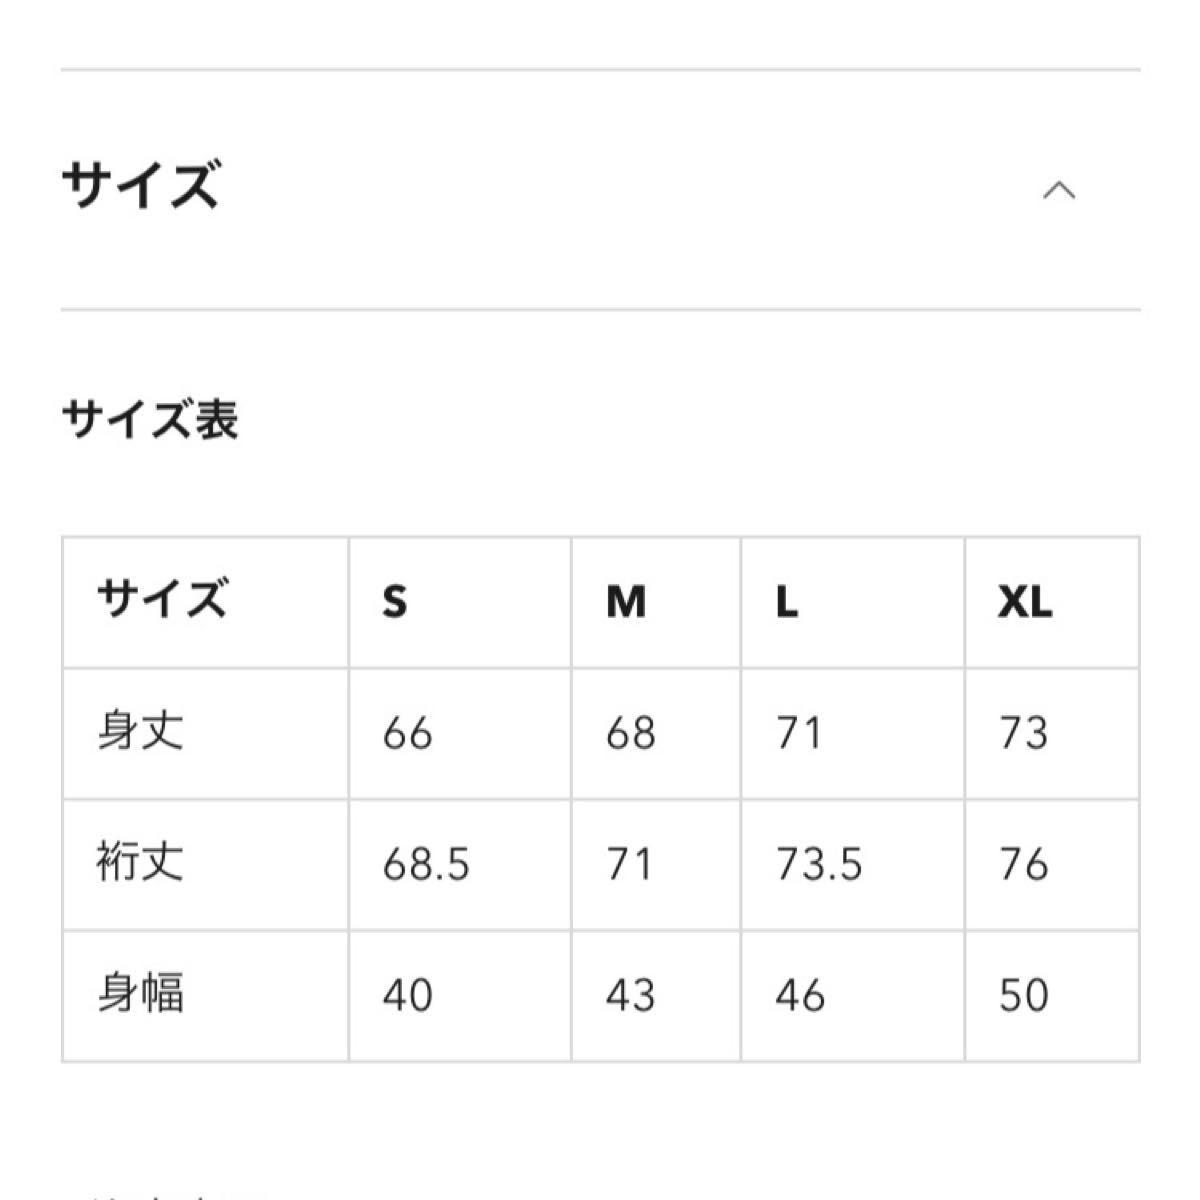 GU ジーユー アンダーシャツ スポーツインナーT ブルー Sサイズ